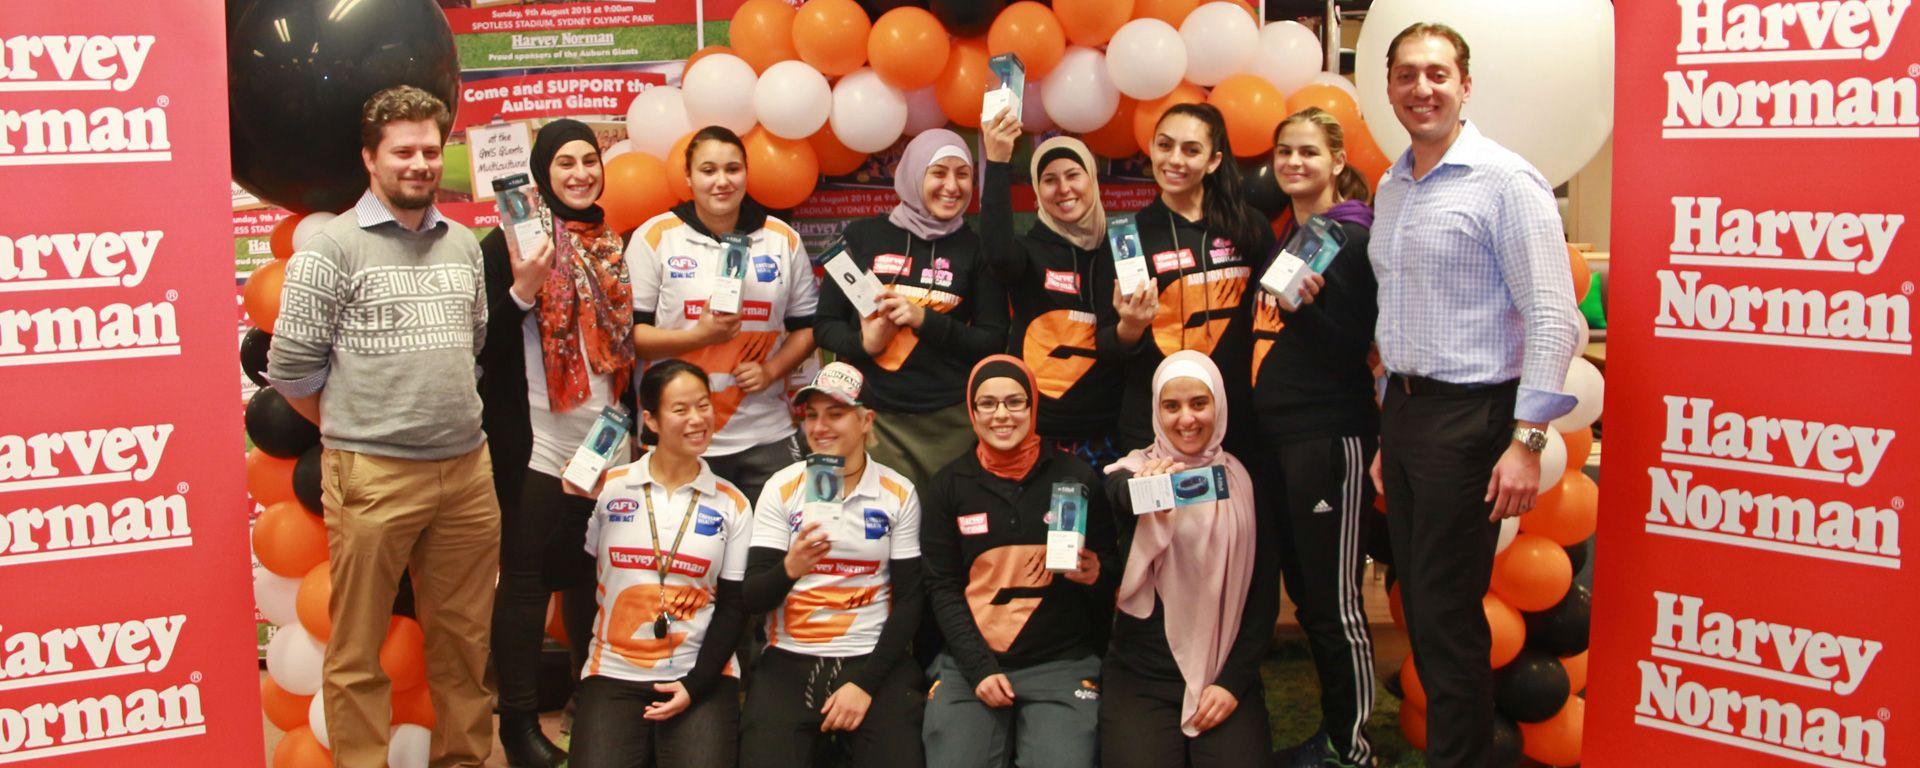 Positive Intercultural Communication With Muslim Australians What